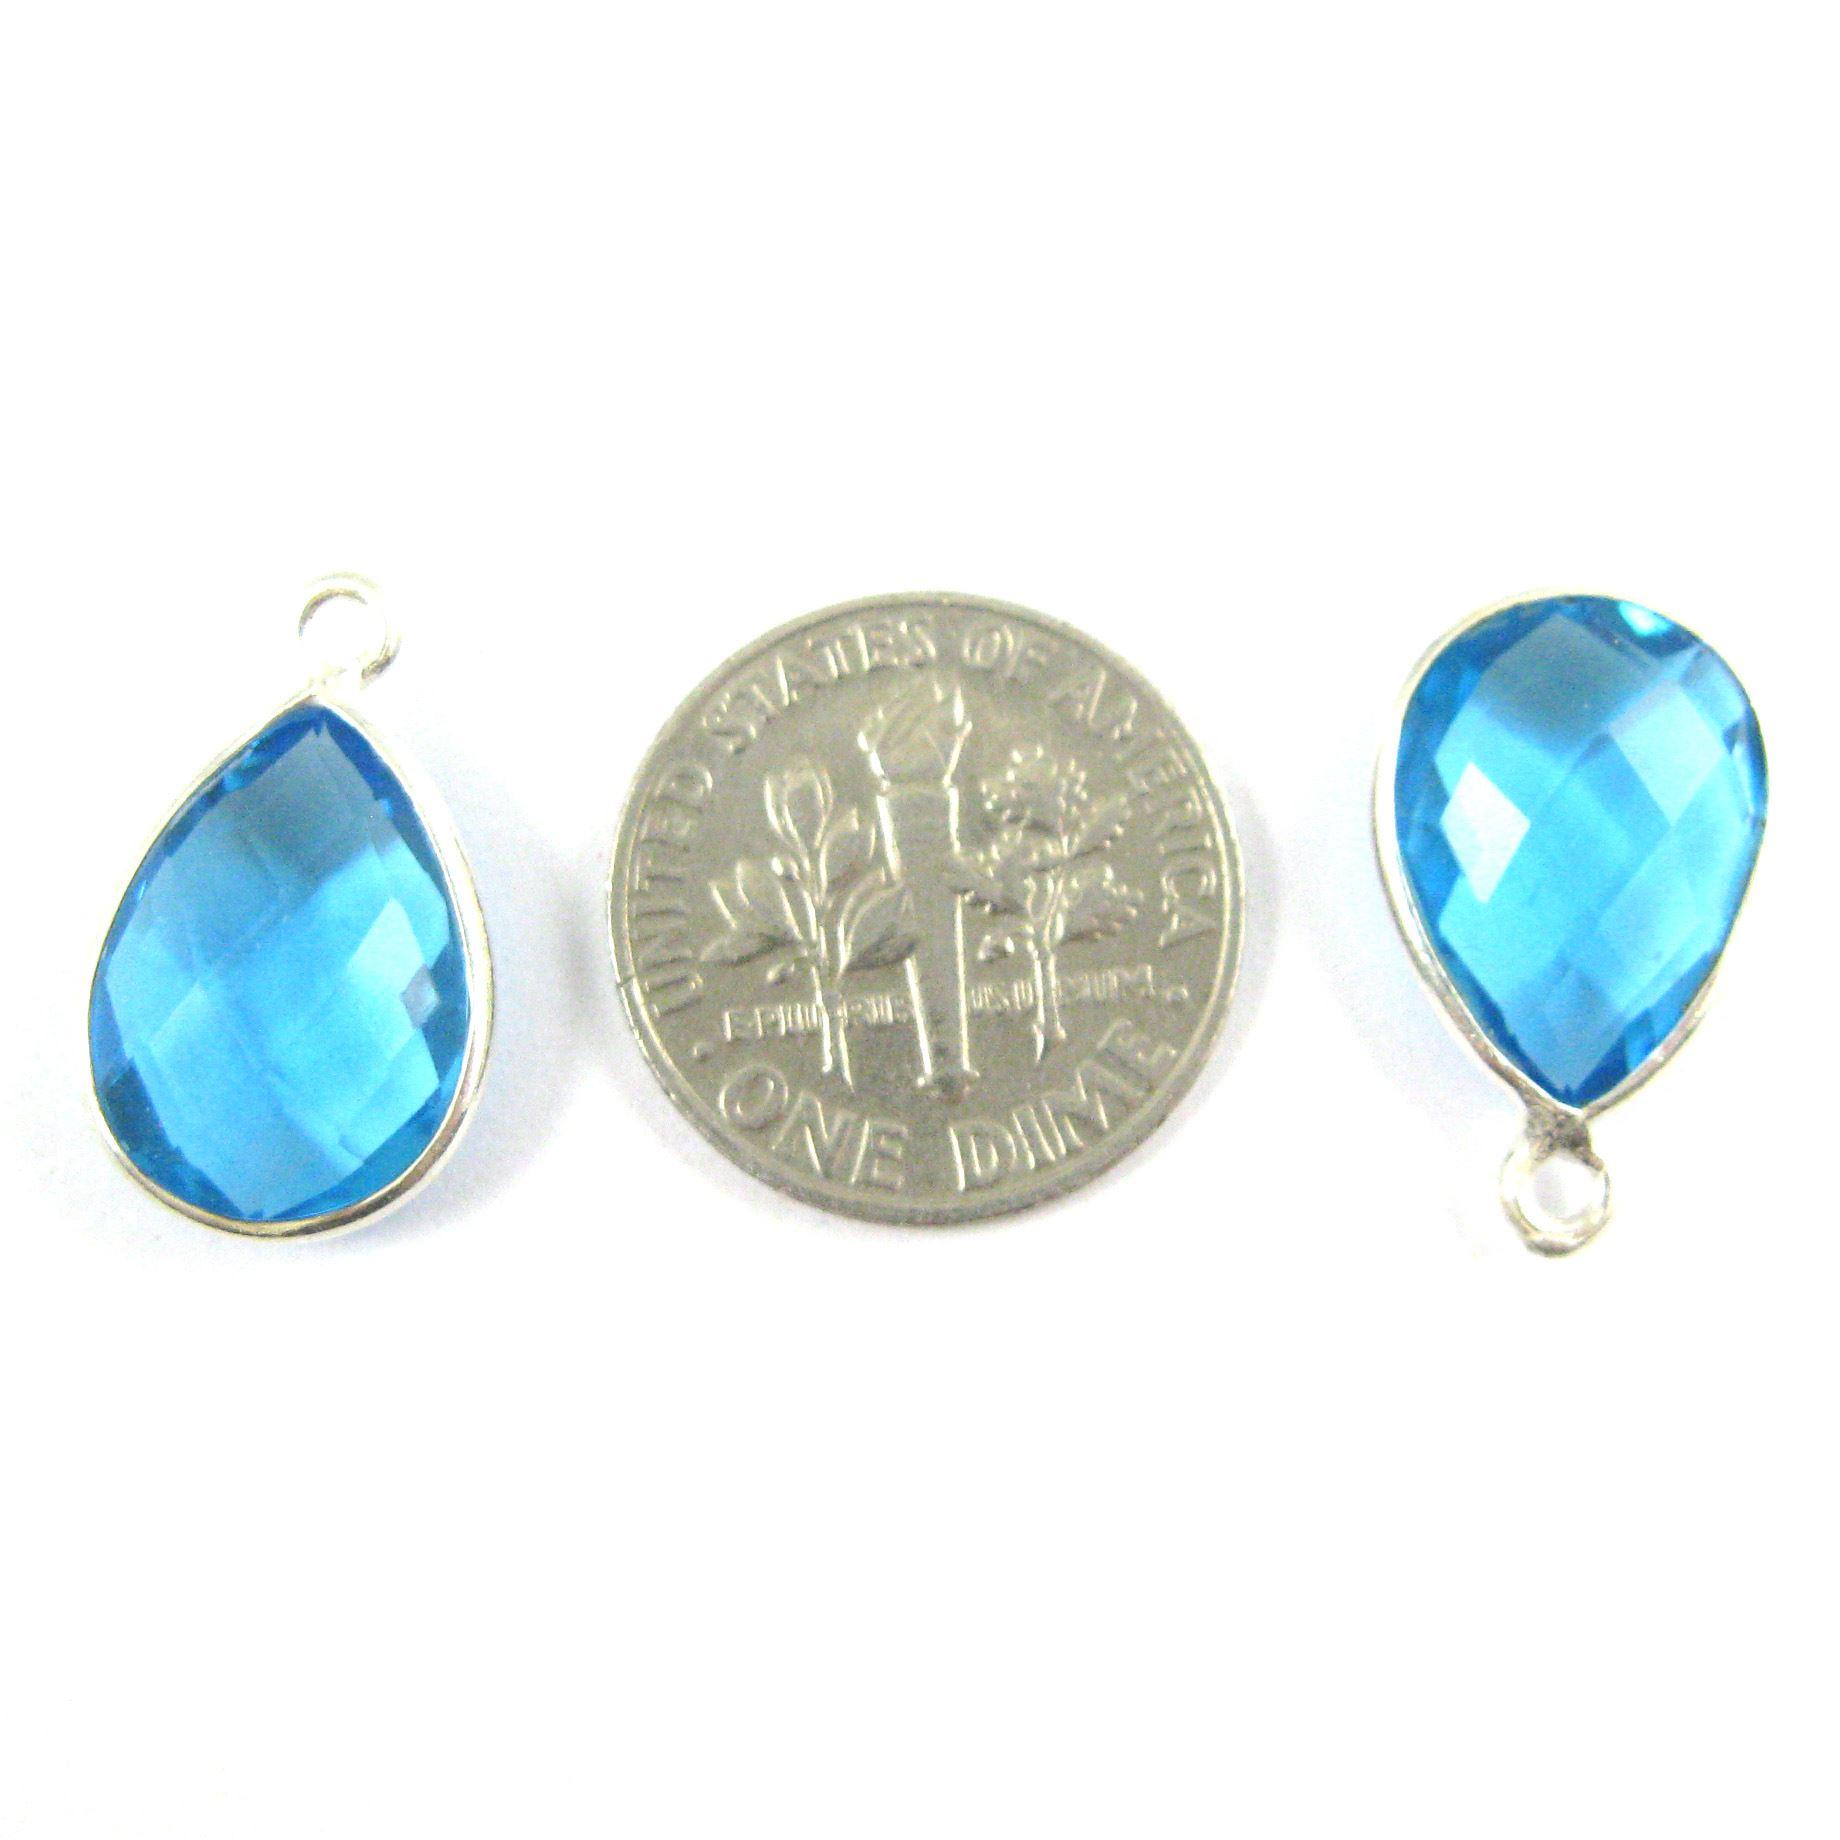 Bezel Gemstone Pendant -Sterling Silver Gem- 10x14mm Faceted Small Teardop Shape - Blue Topaz Quartz  (sold per 2 pieces)